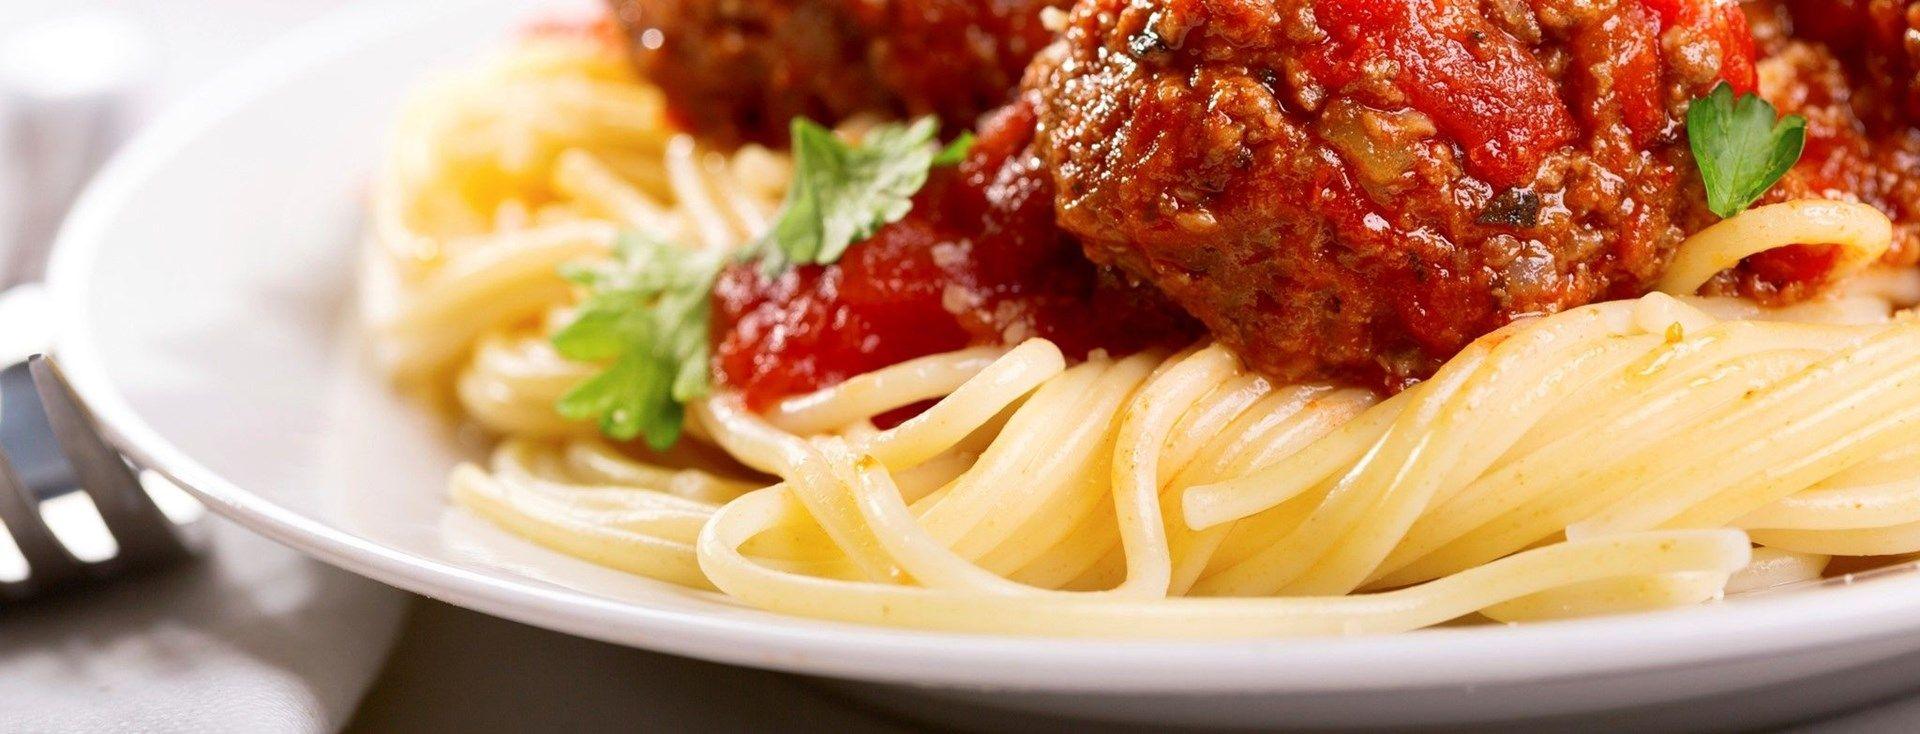 Italian Restaurant   Italian recipes, Italian food near me ...